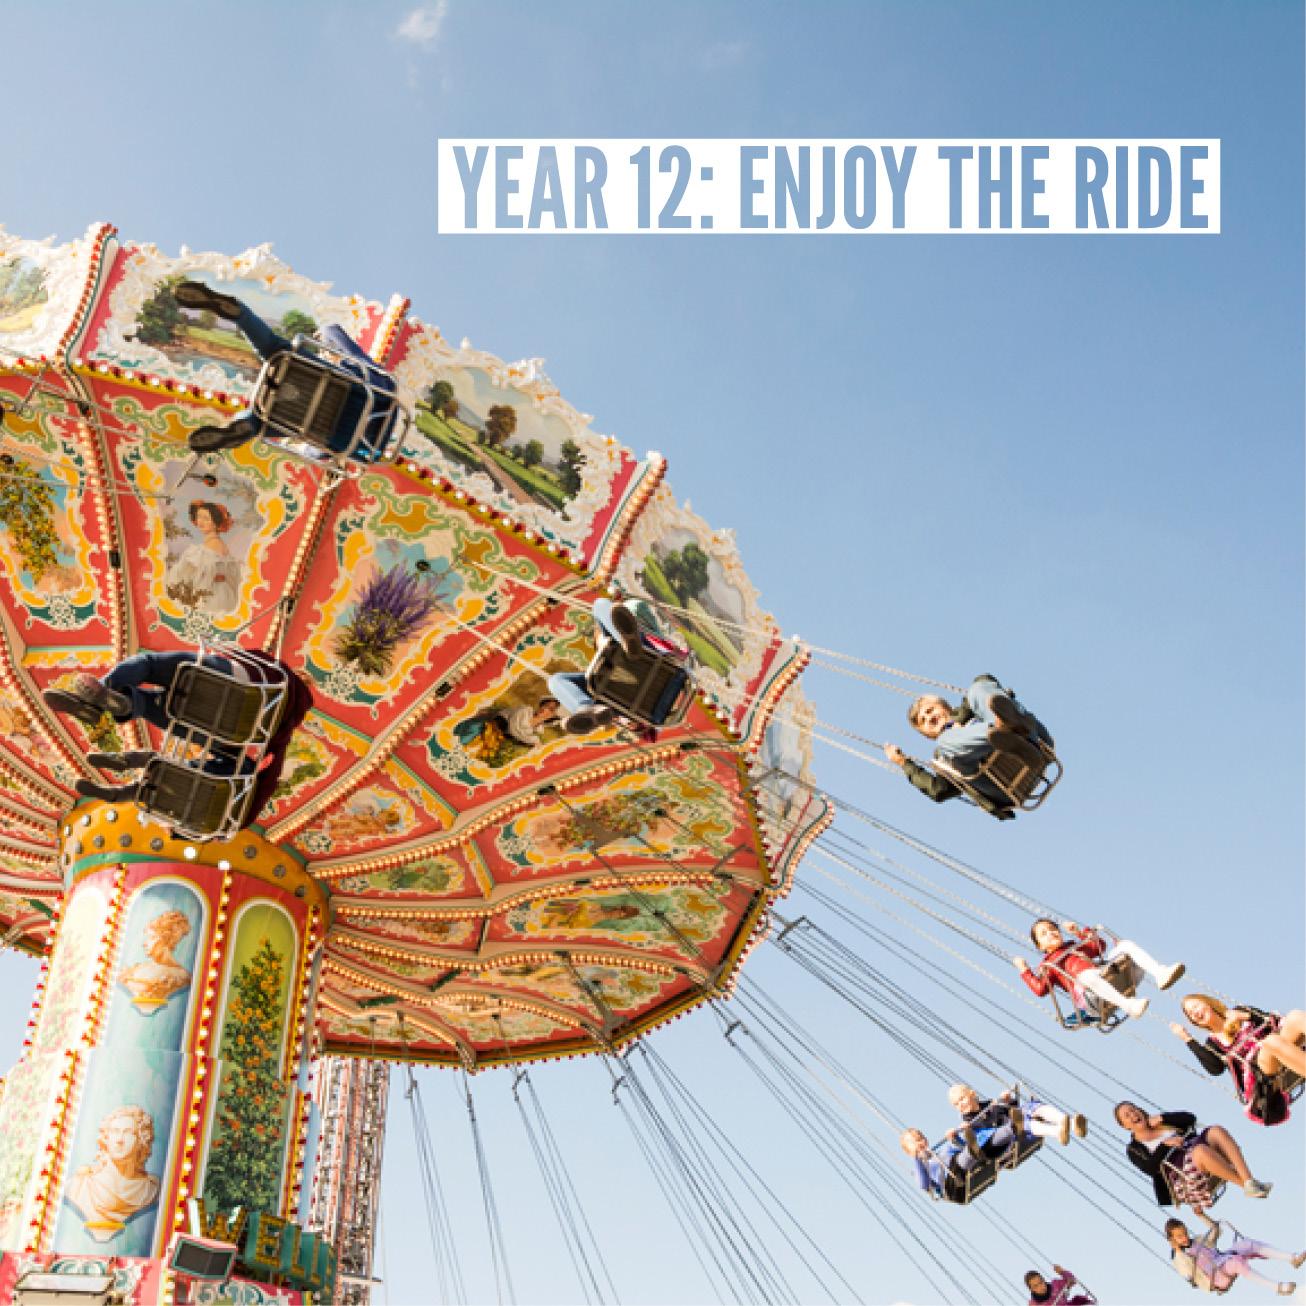 Children on a high flying carousel